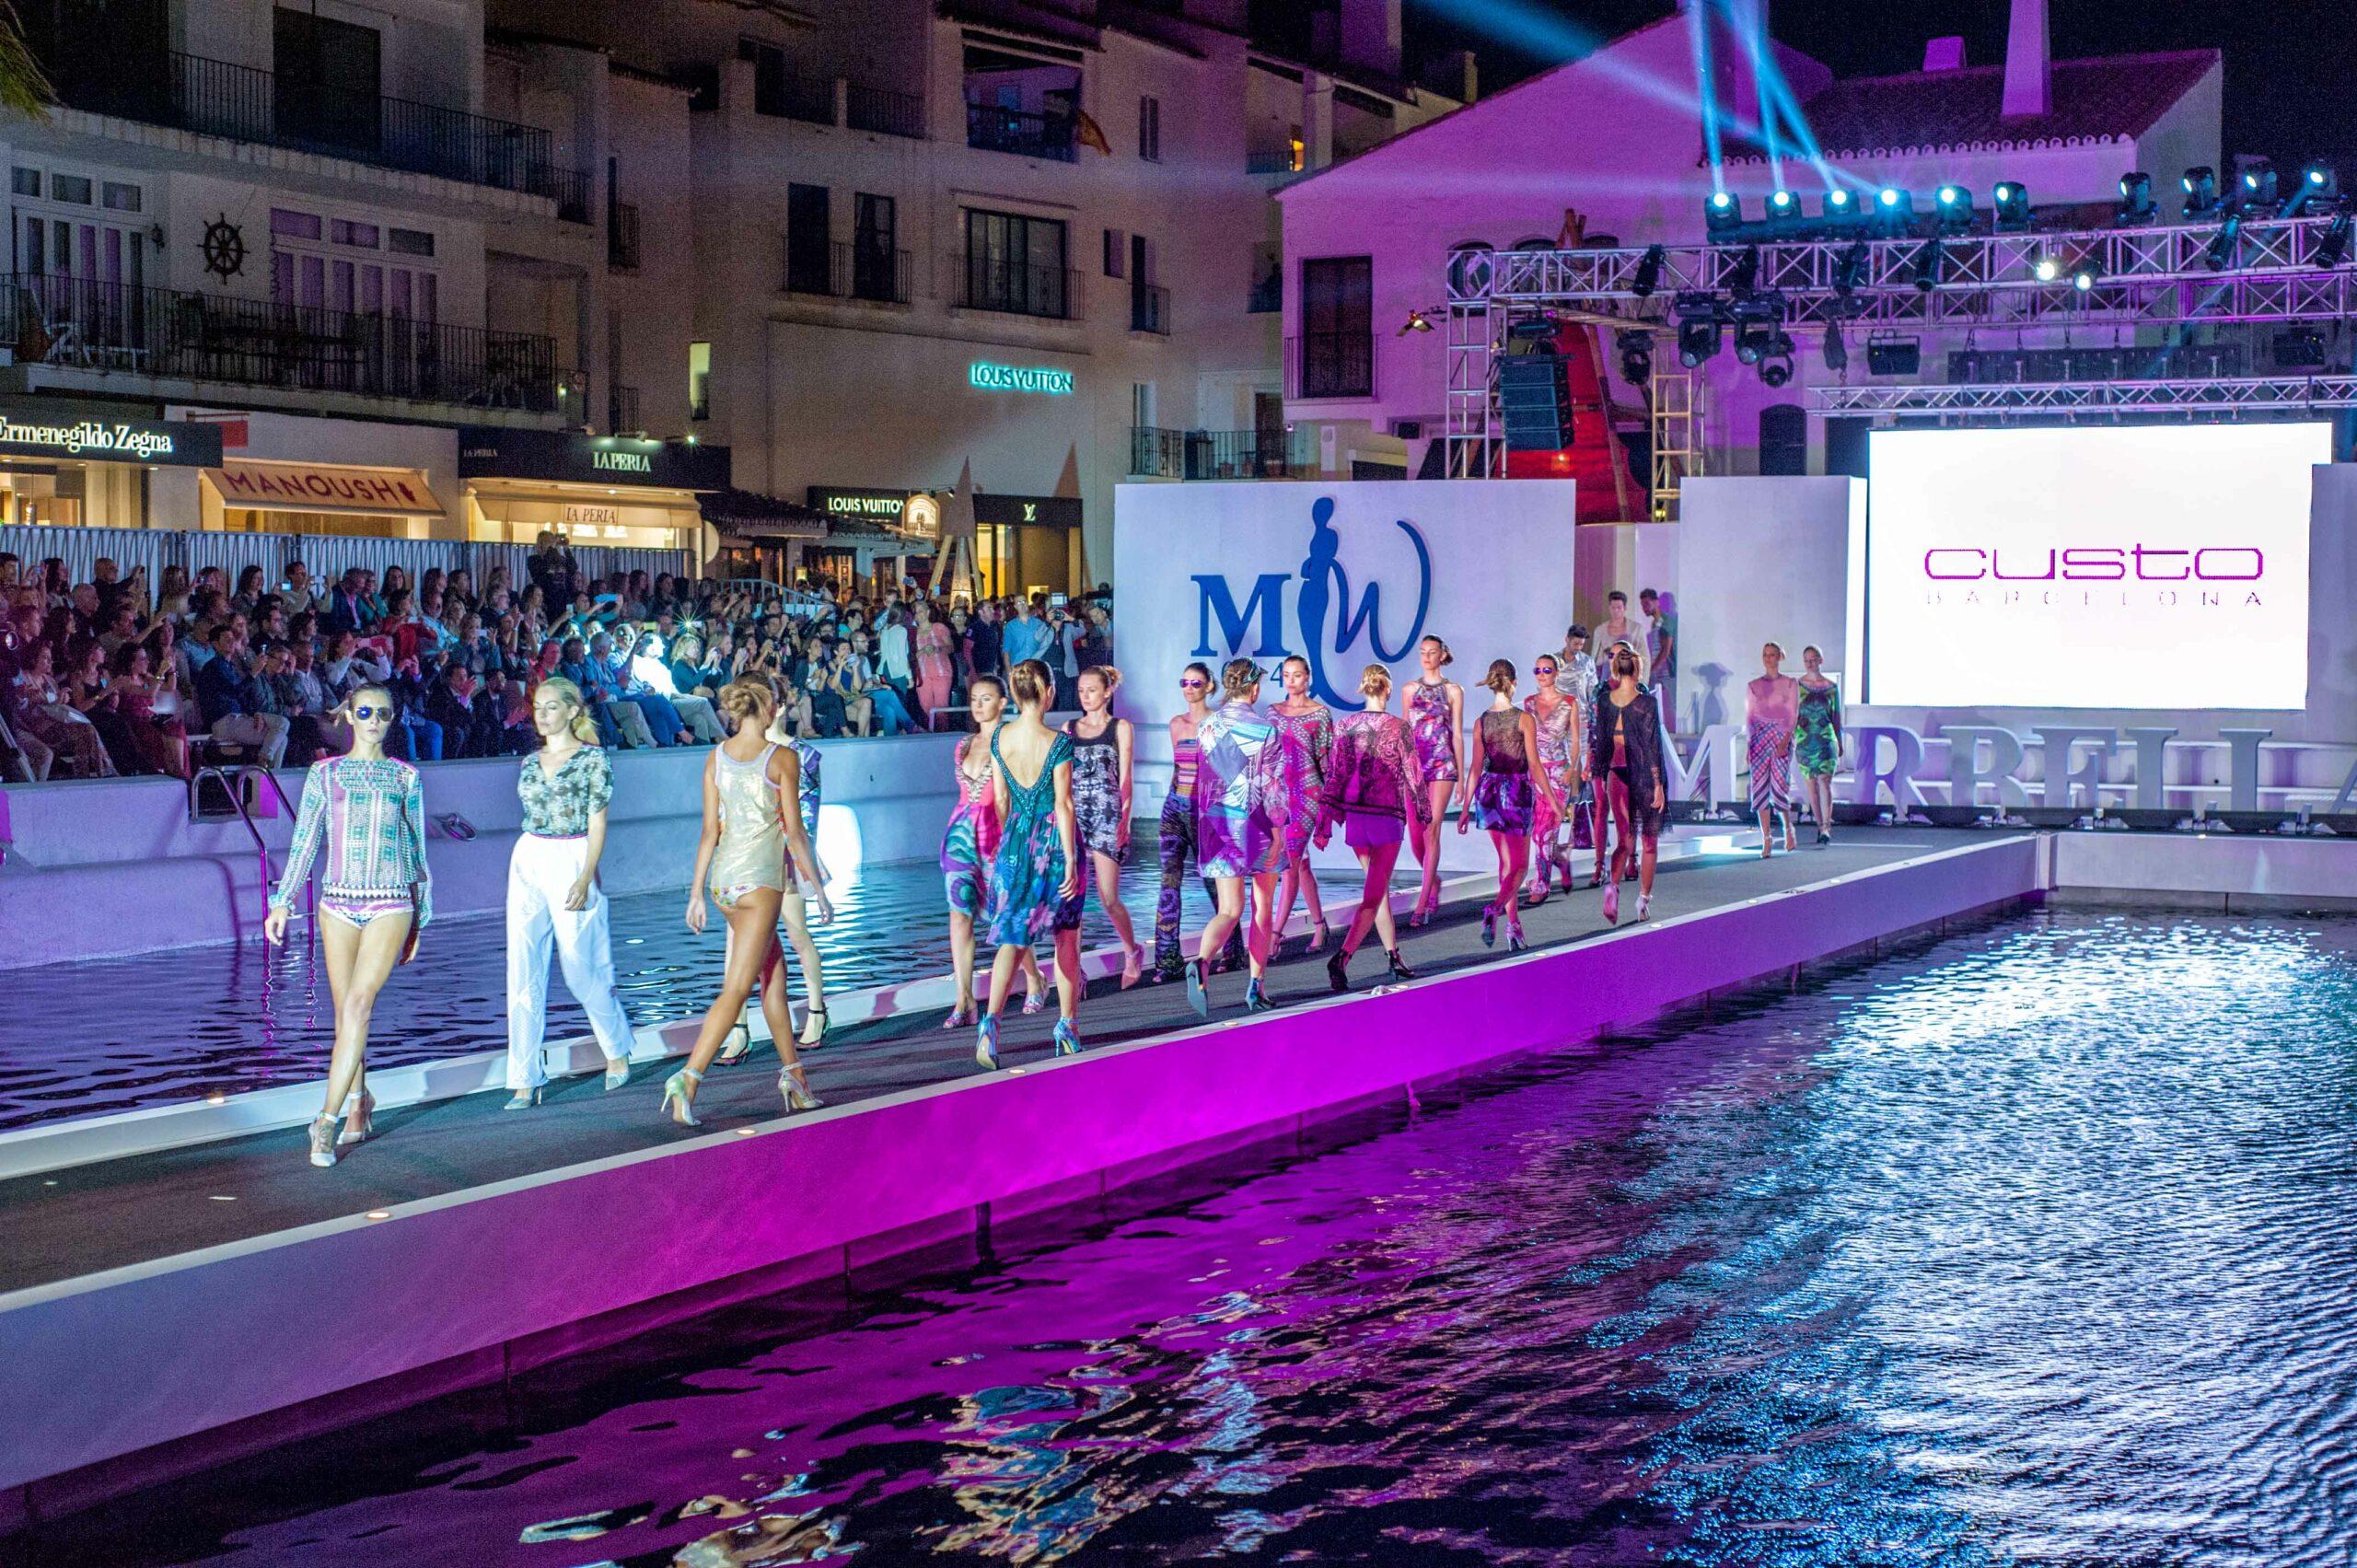 Marbella Luxury Weekend: pasarela flotante